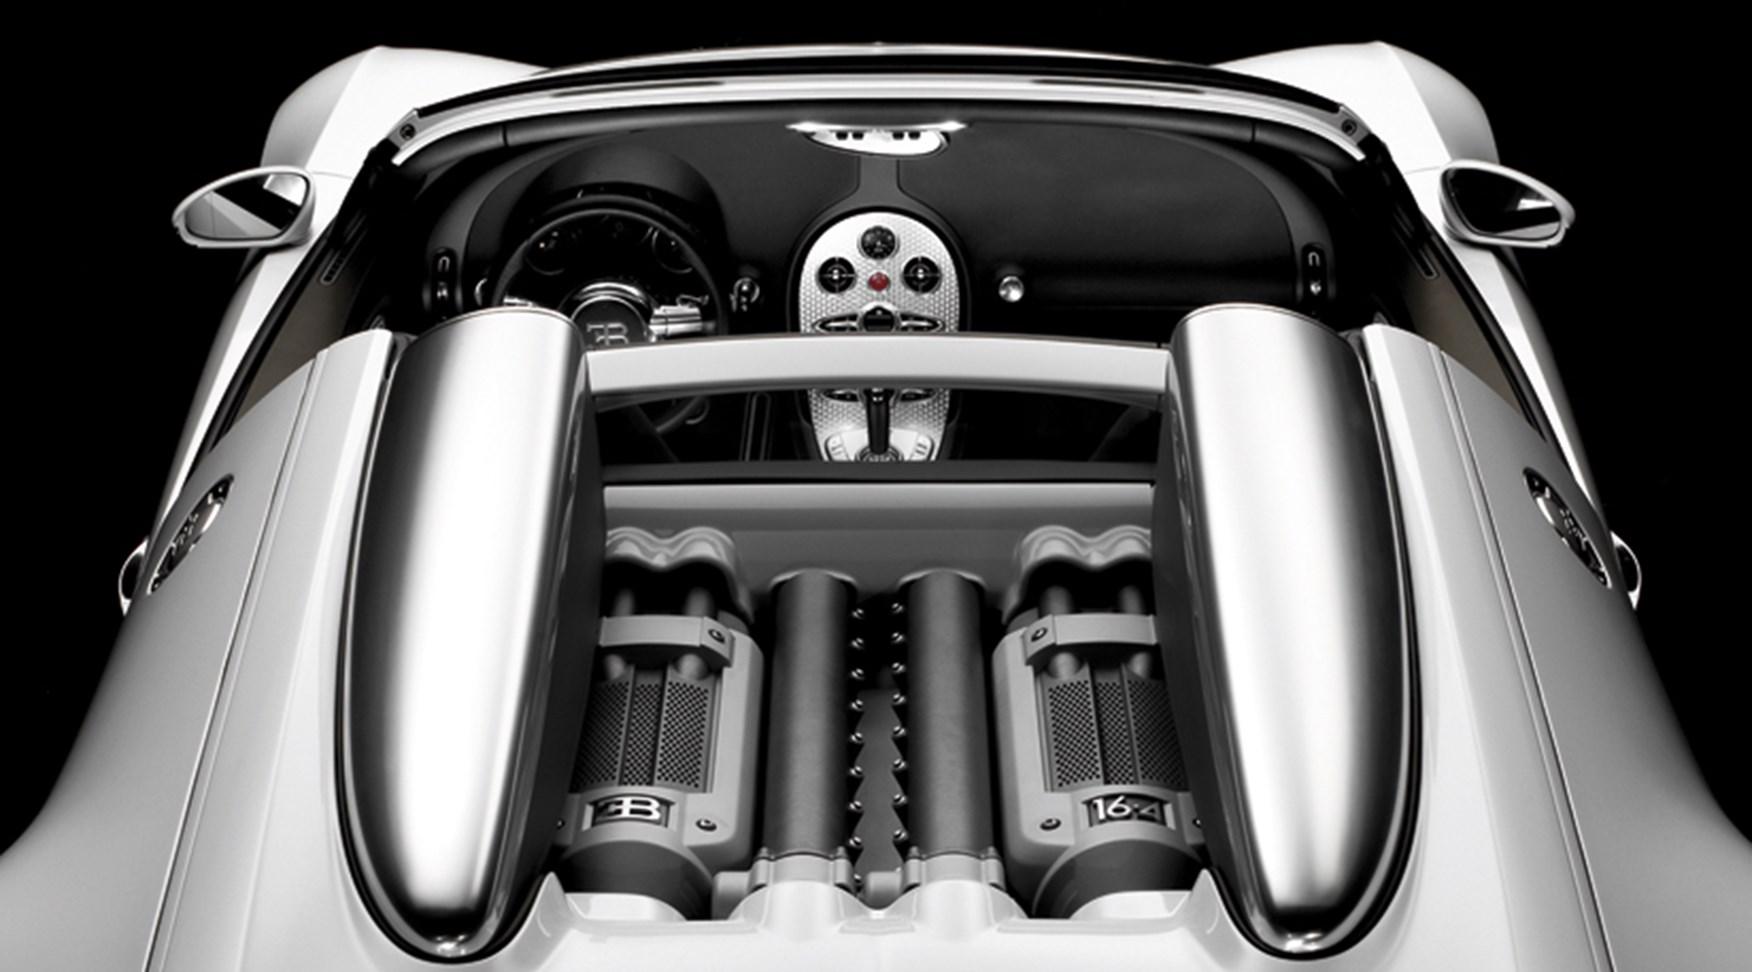 The Power Of Three We Take A Tour Of Maserati S Latest Trimaran